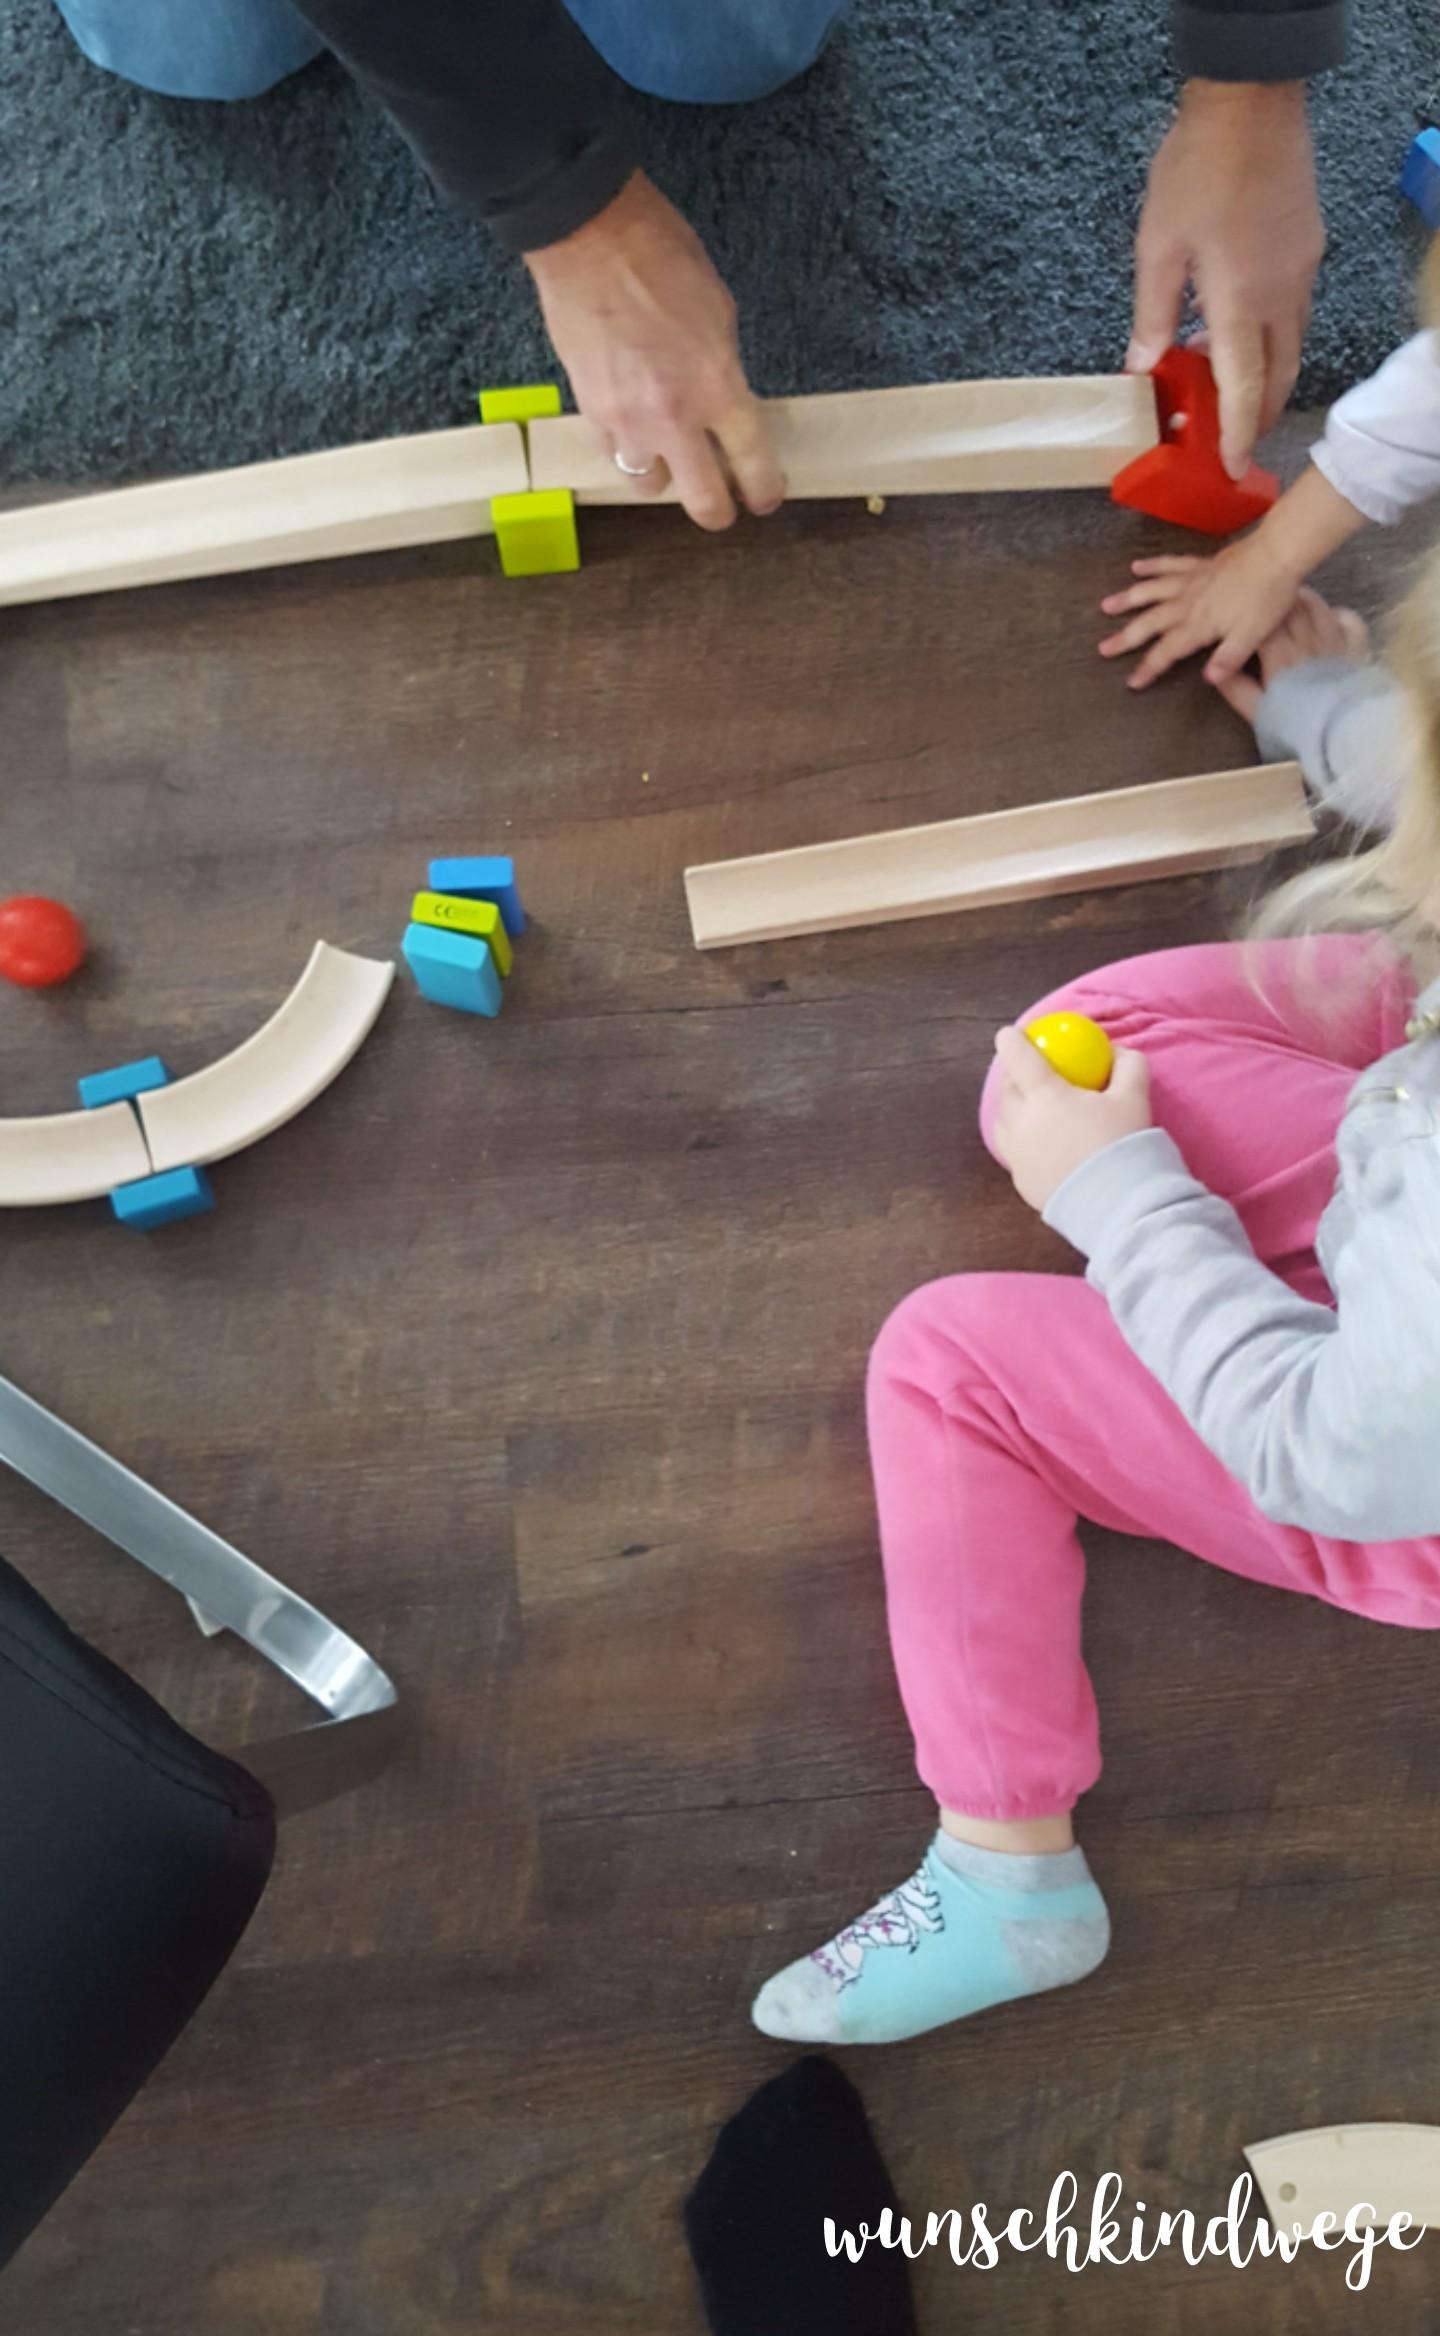 12 von 12 - September 2017: Kugelbahn